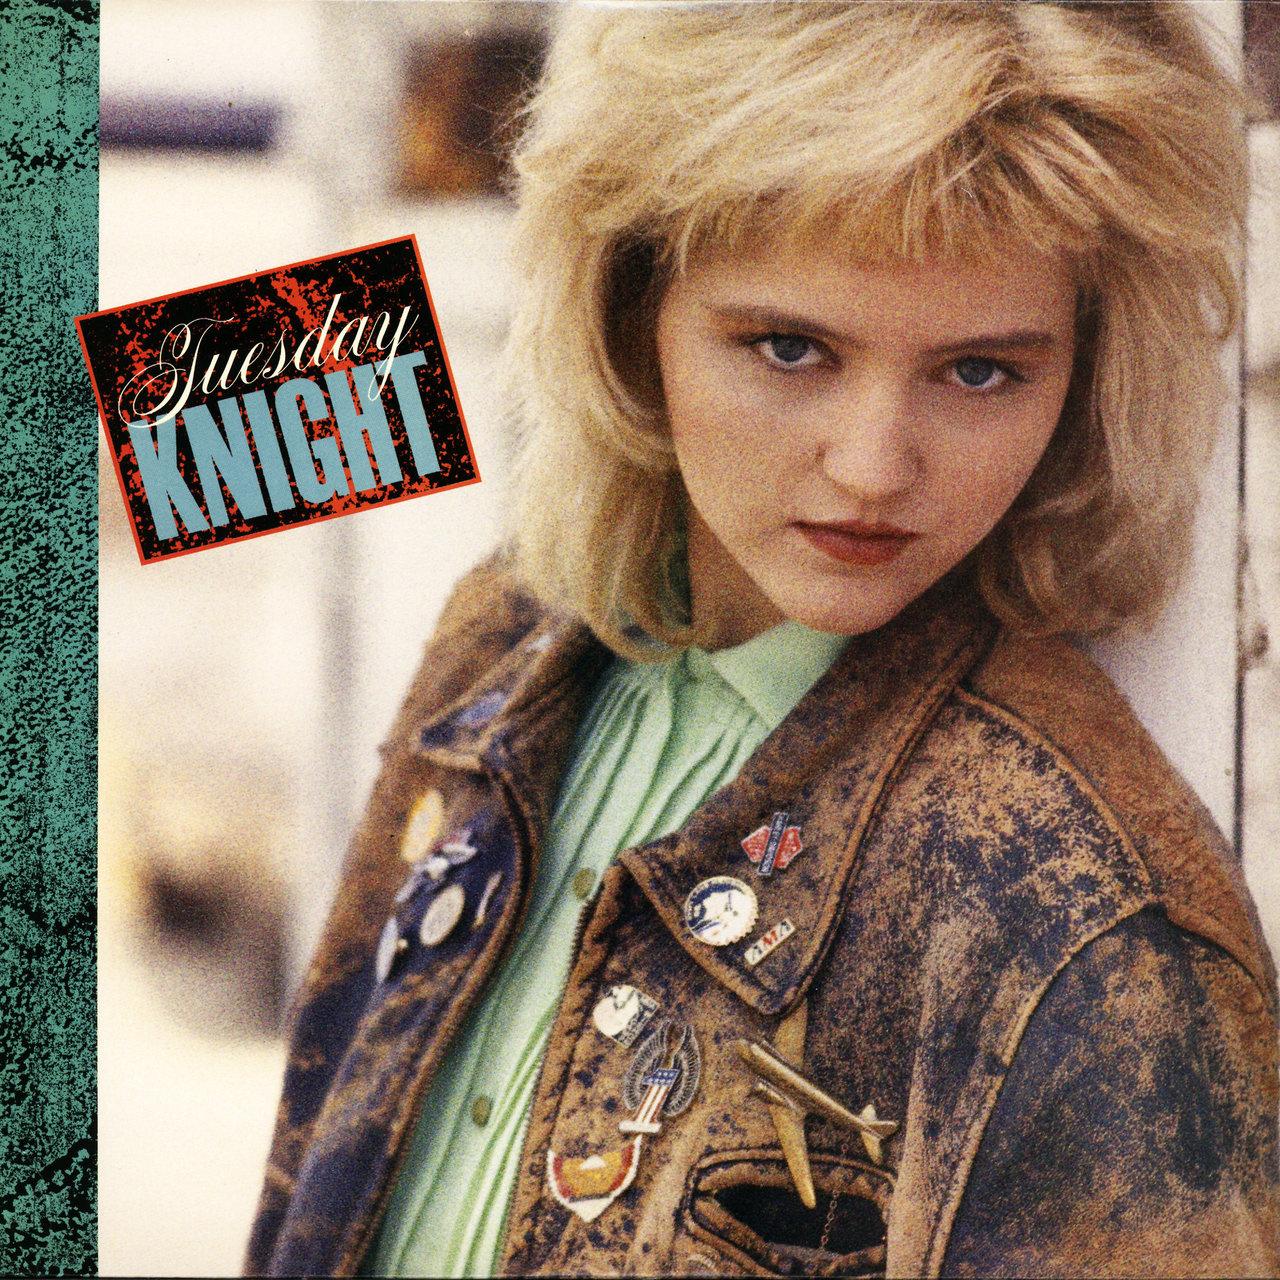 Tuesday Knight Nude Photos 8